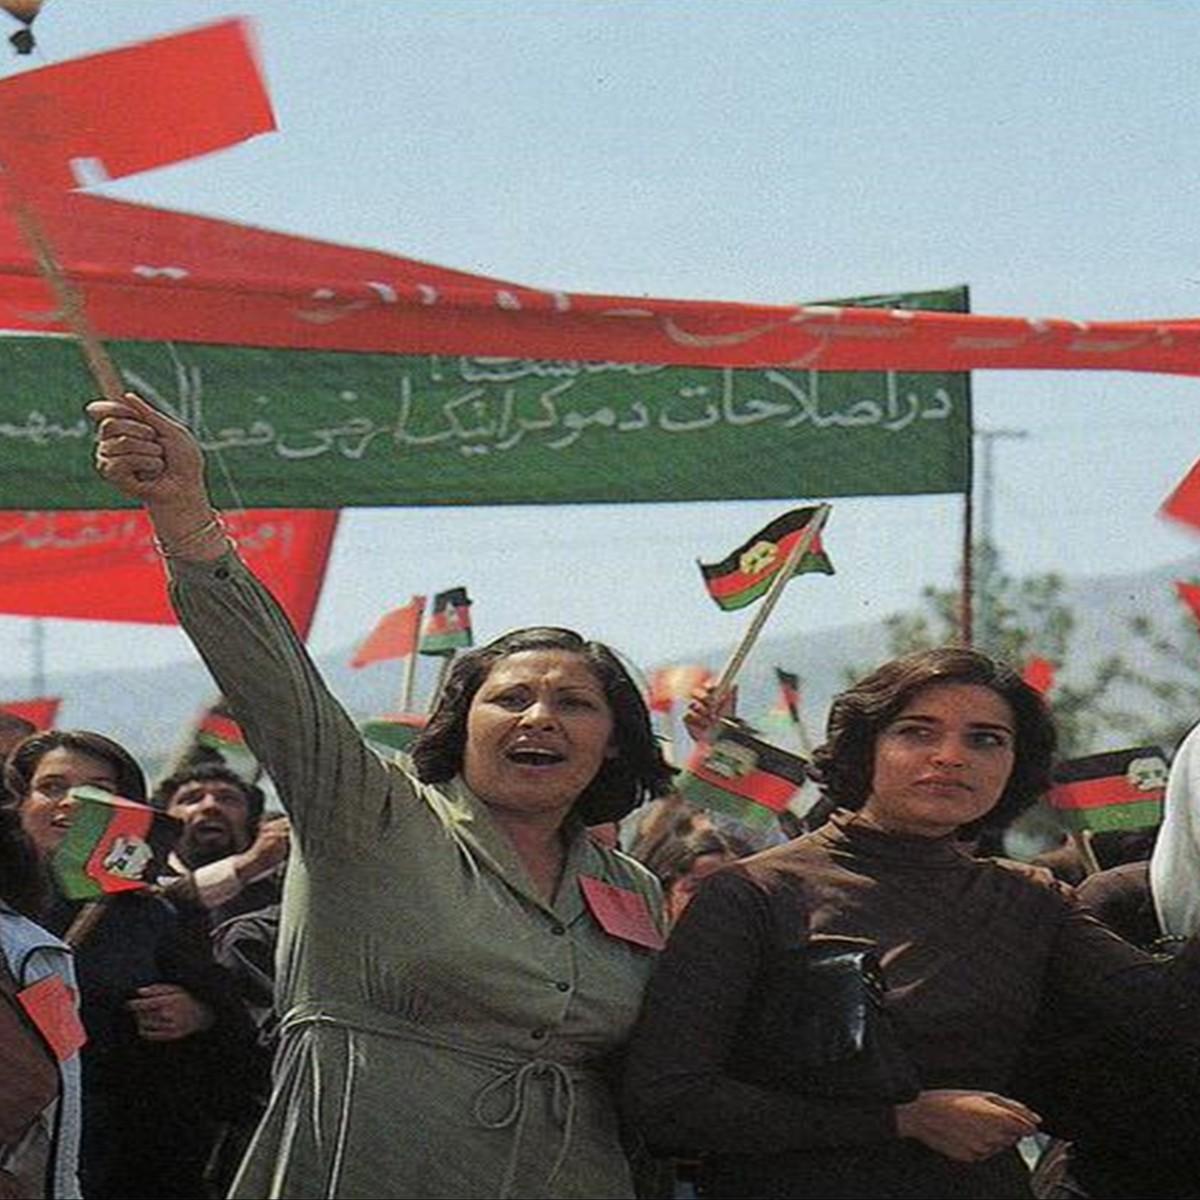 Kabul, marcia delle donne afghane negli anni '80